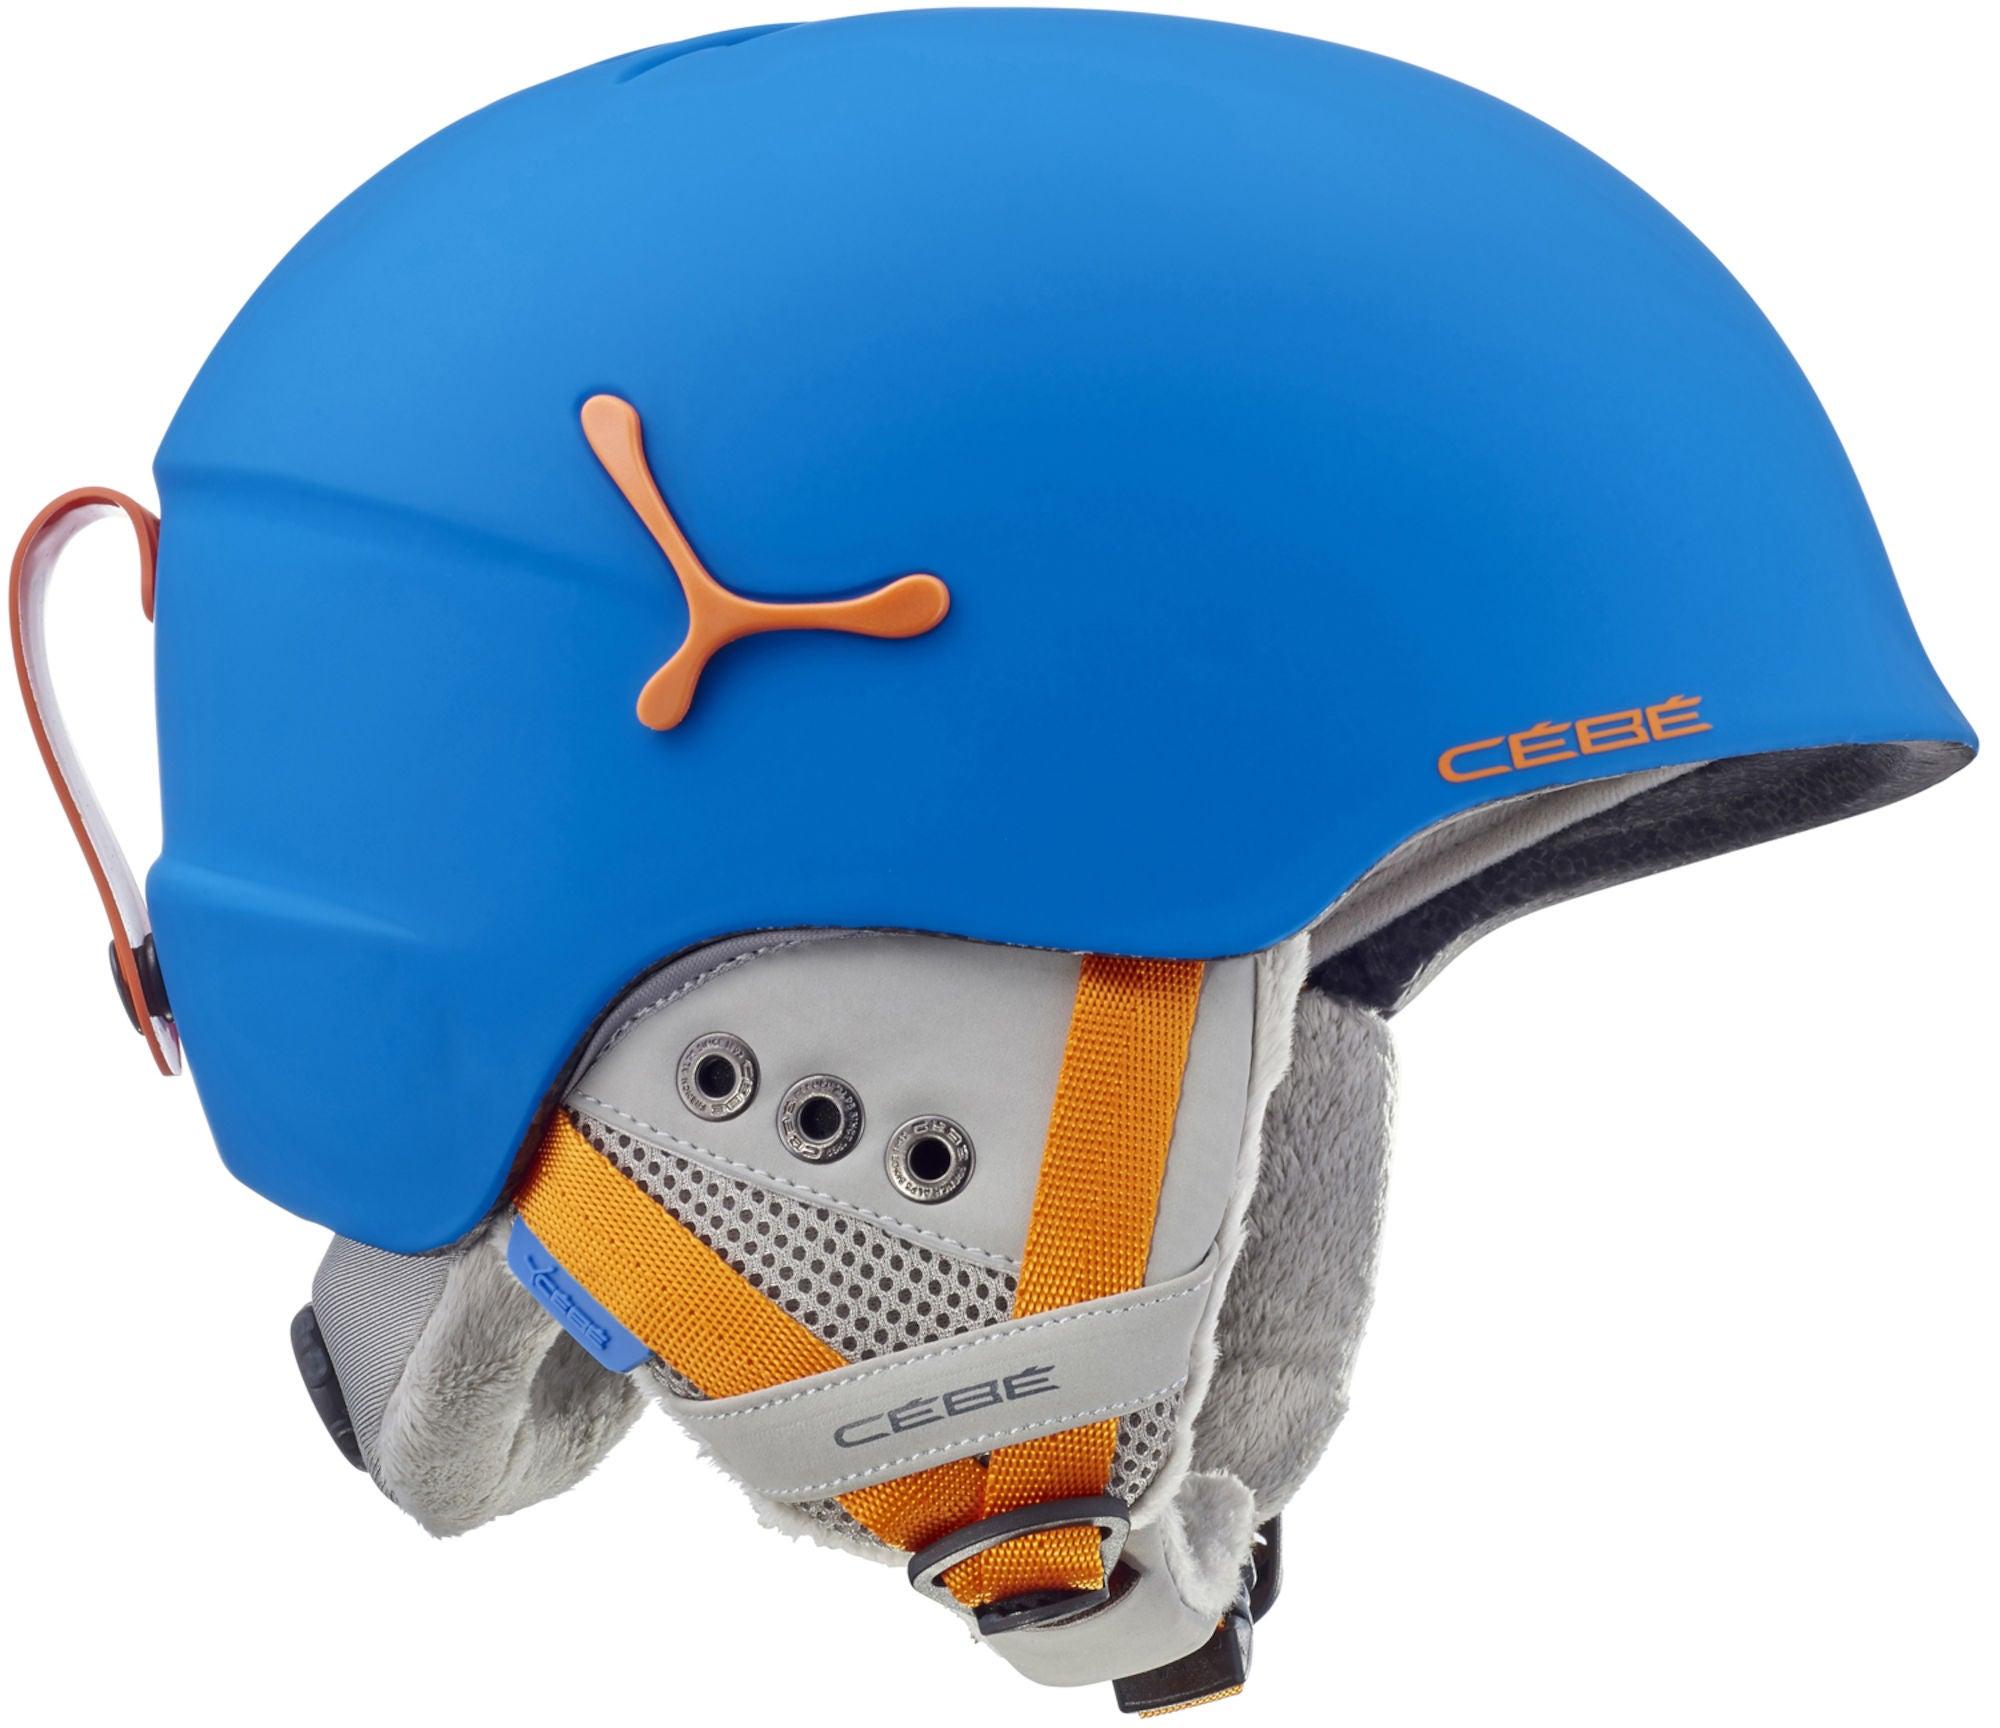 Cébé Suspense Deluxe Skidhjälm, Blue/Orange 51-53